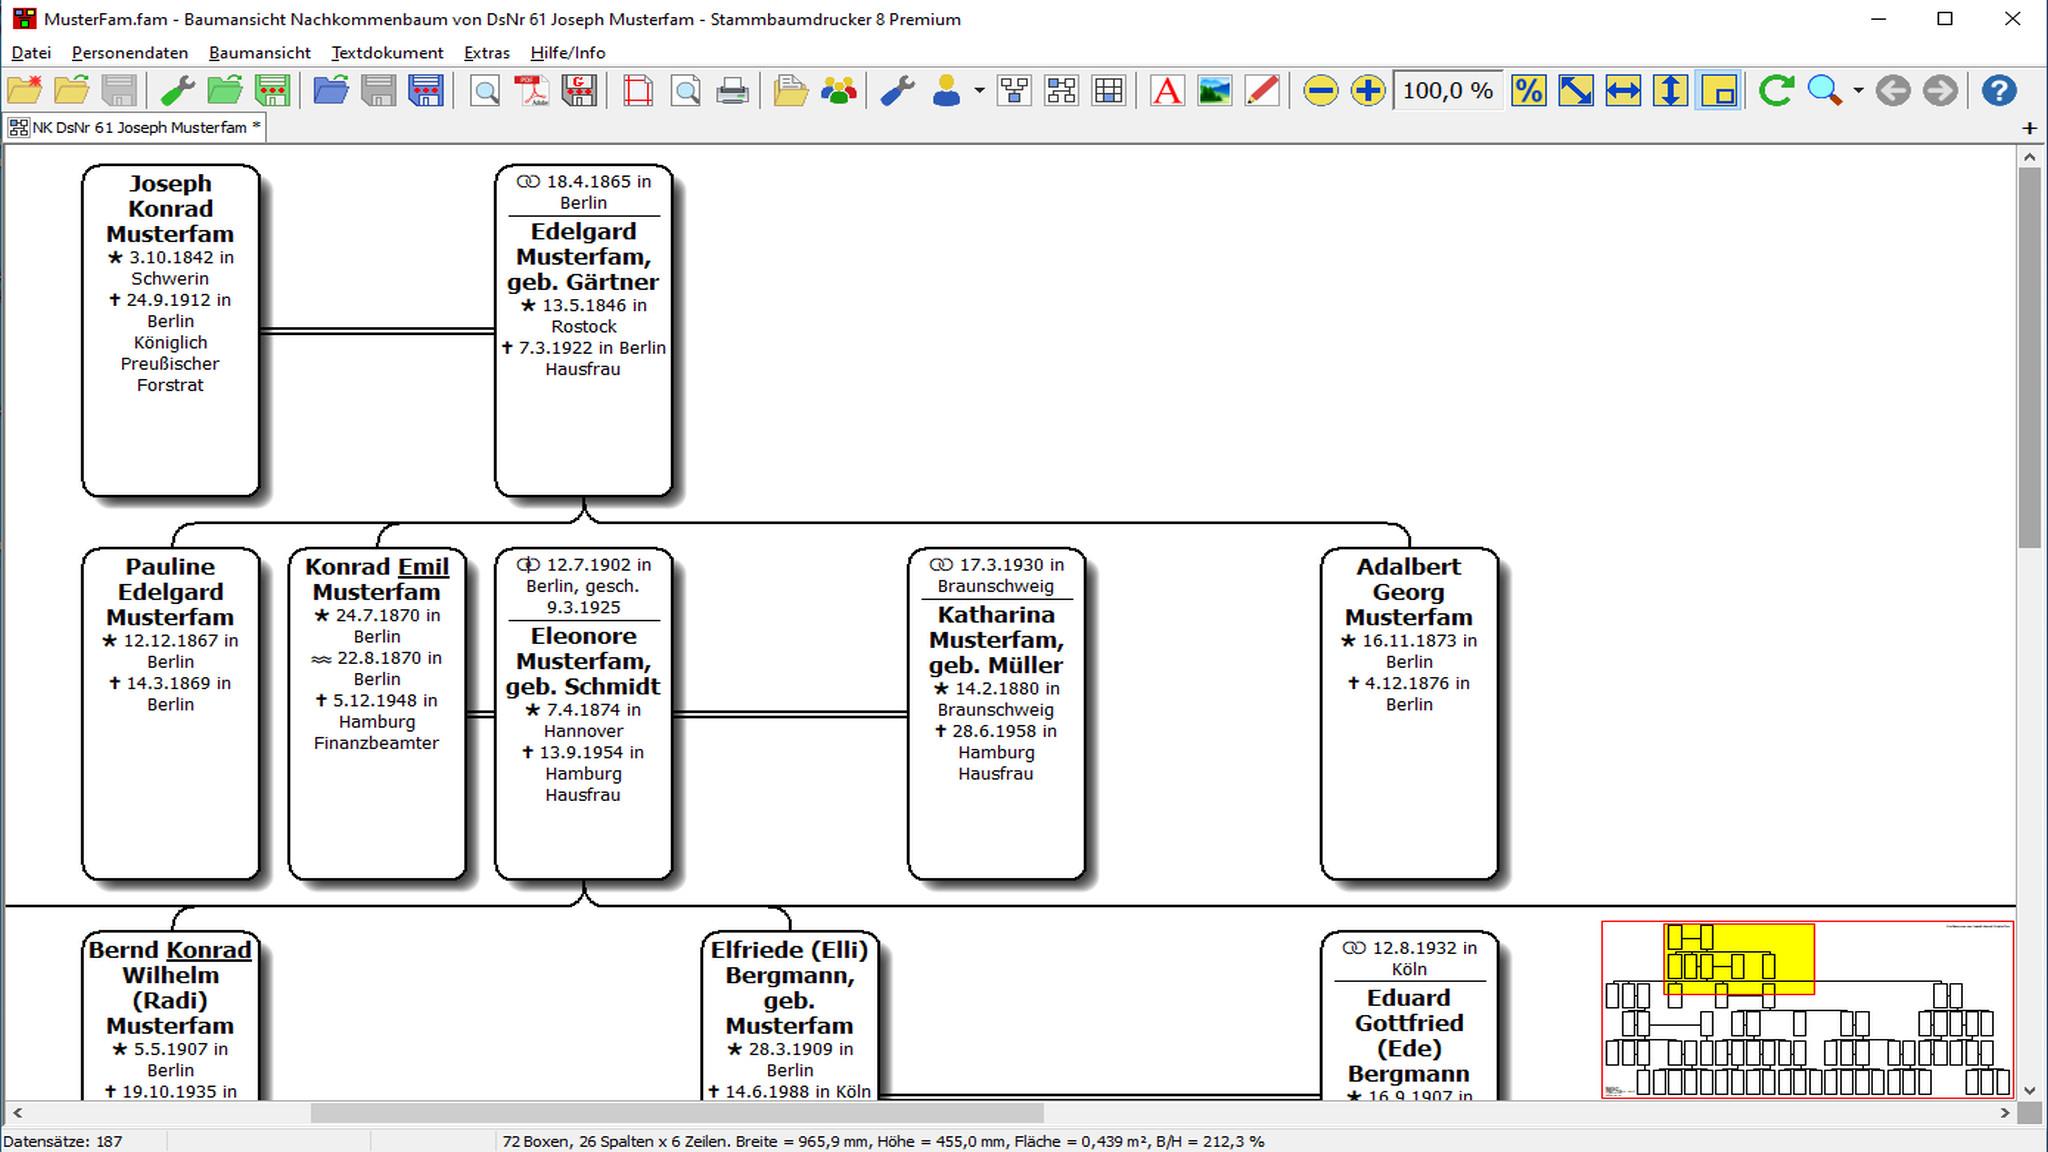 Screenshot 1 - Stammbaumdrucker